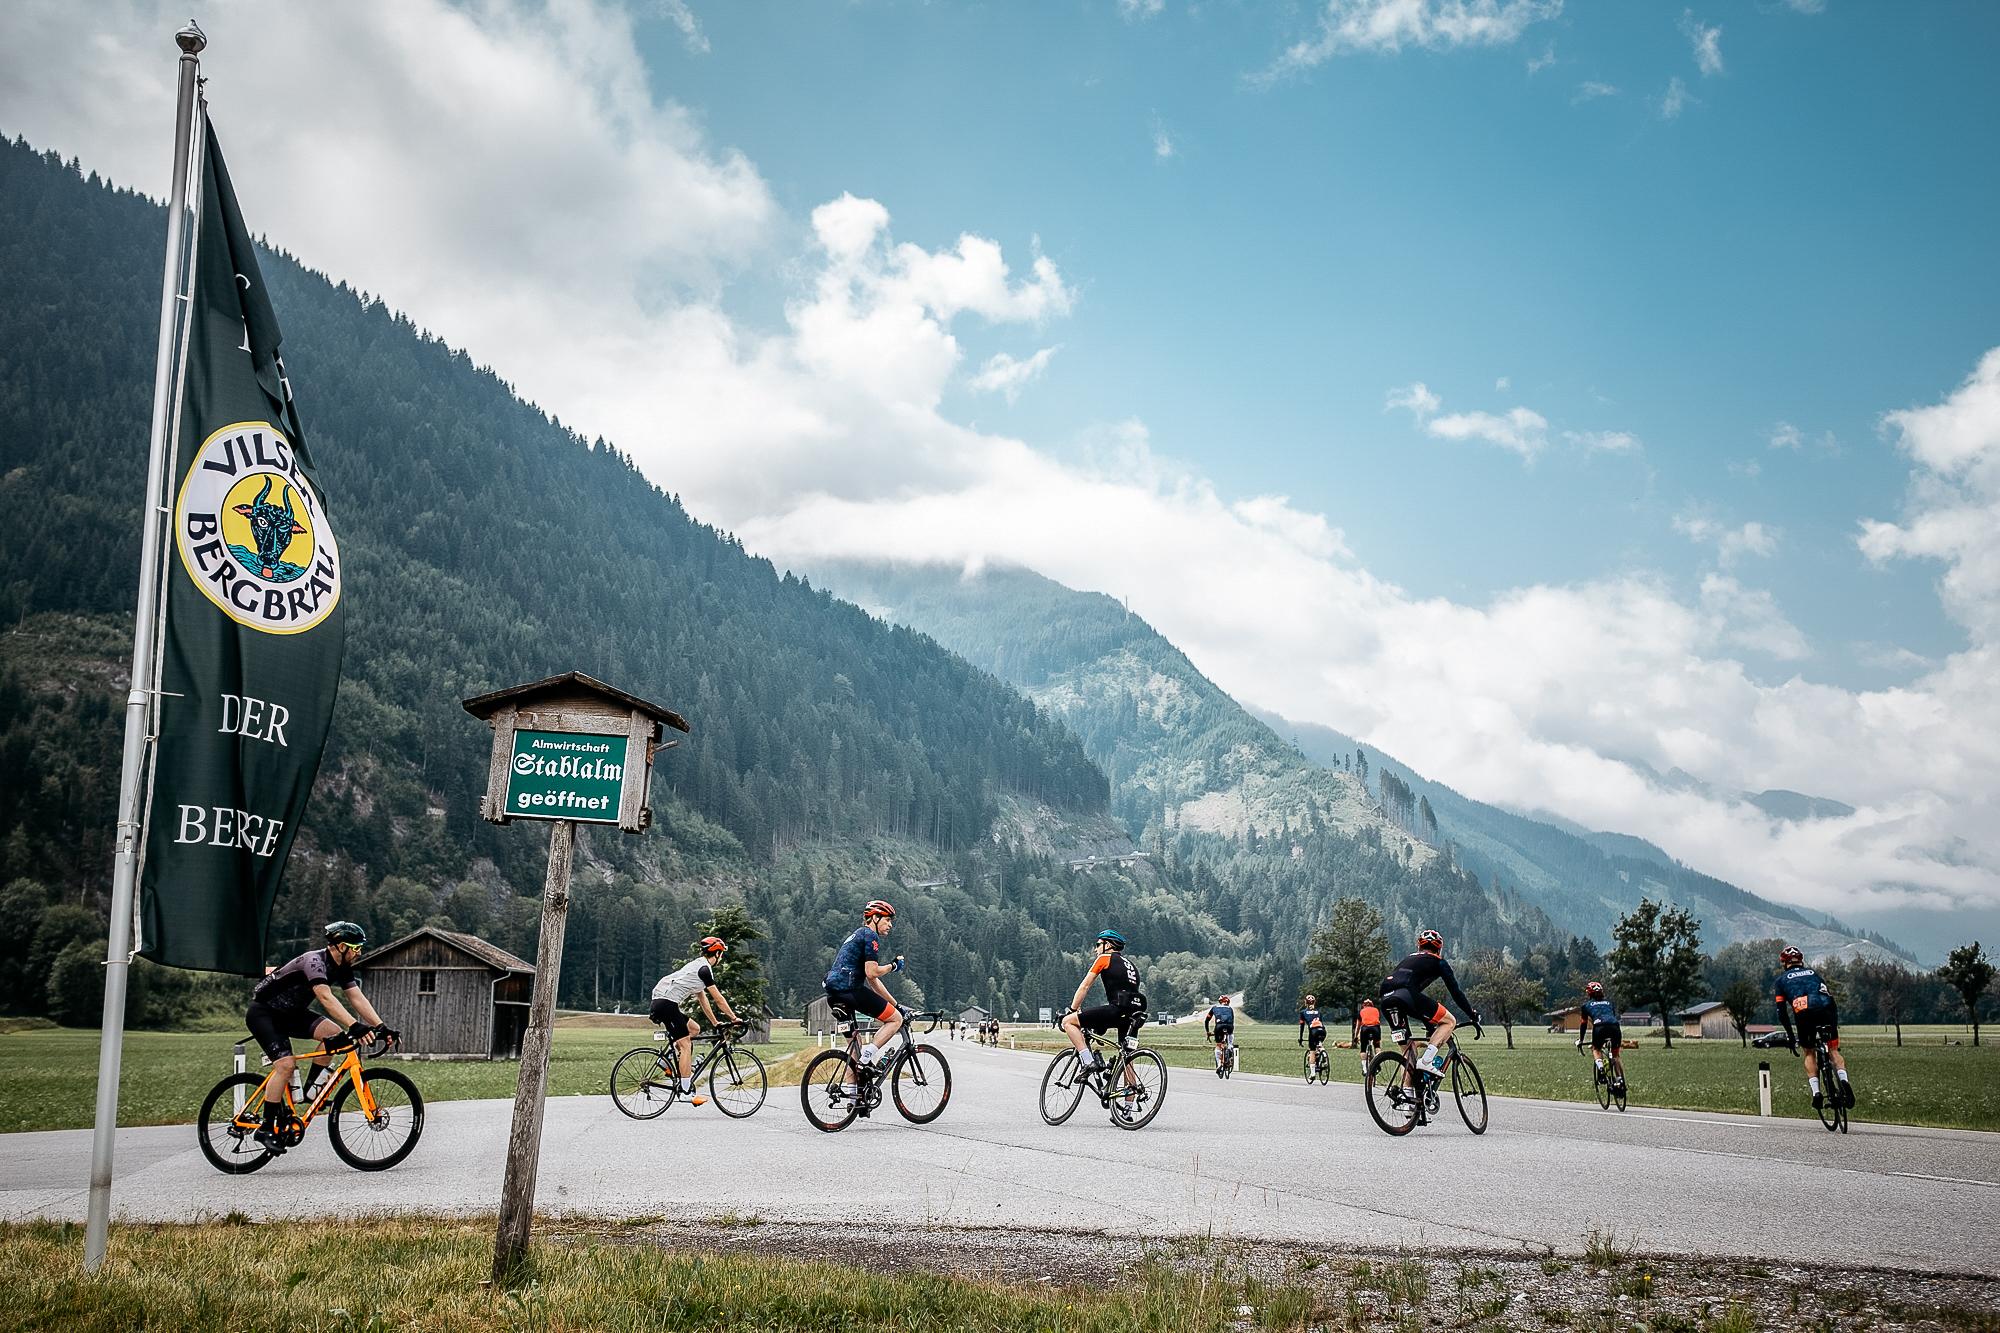 Rad-Race_TDF_3_09-07-2019_CST3351(c)Christoph_Steinweg.jpg